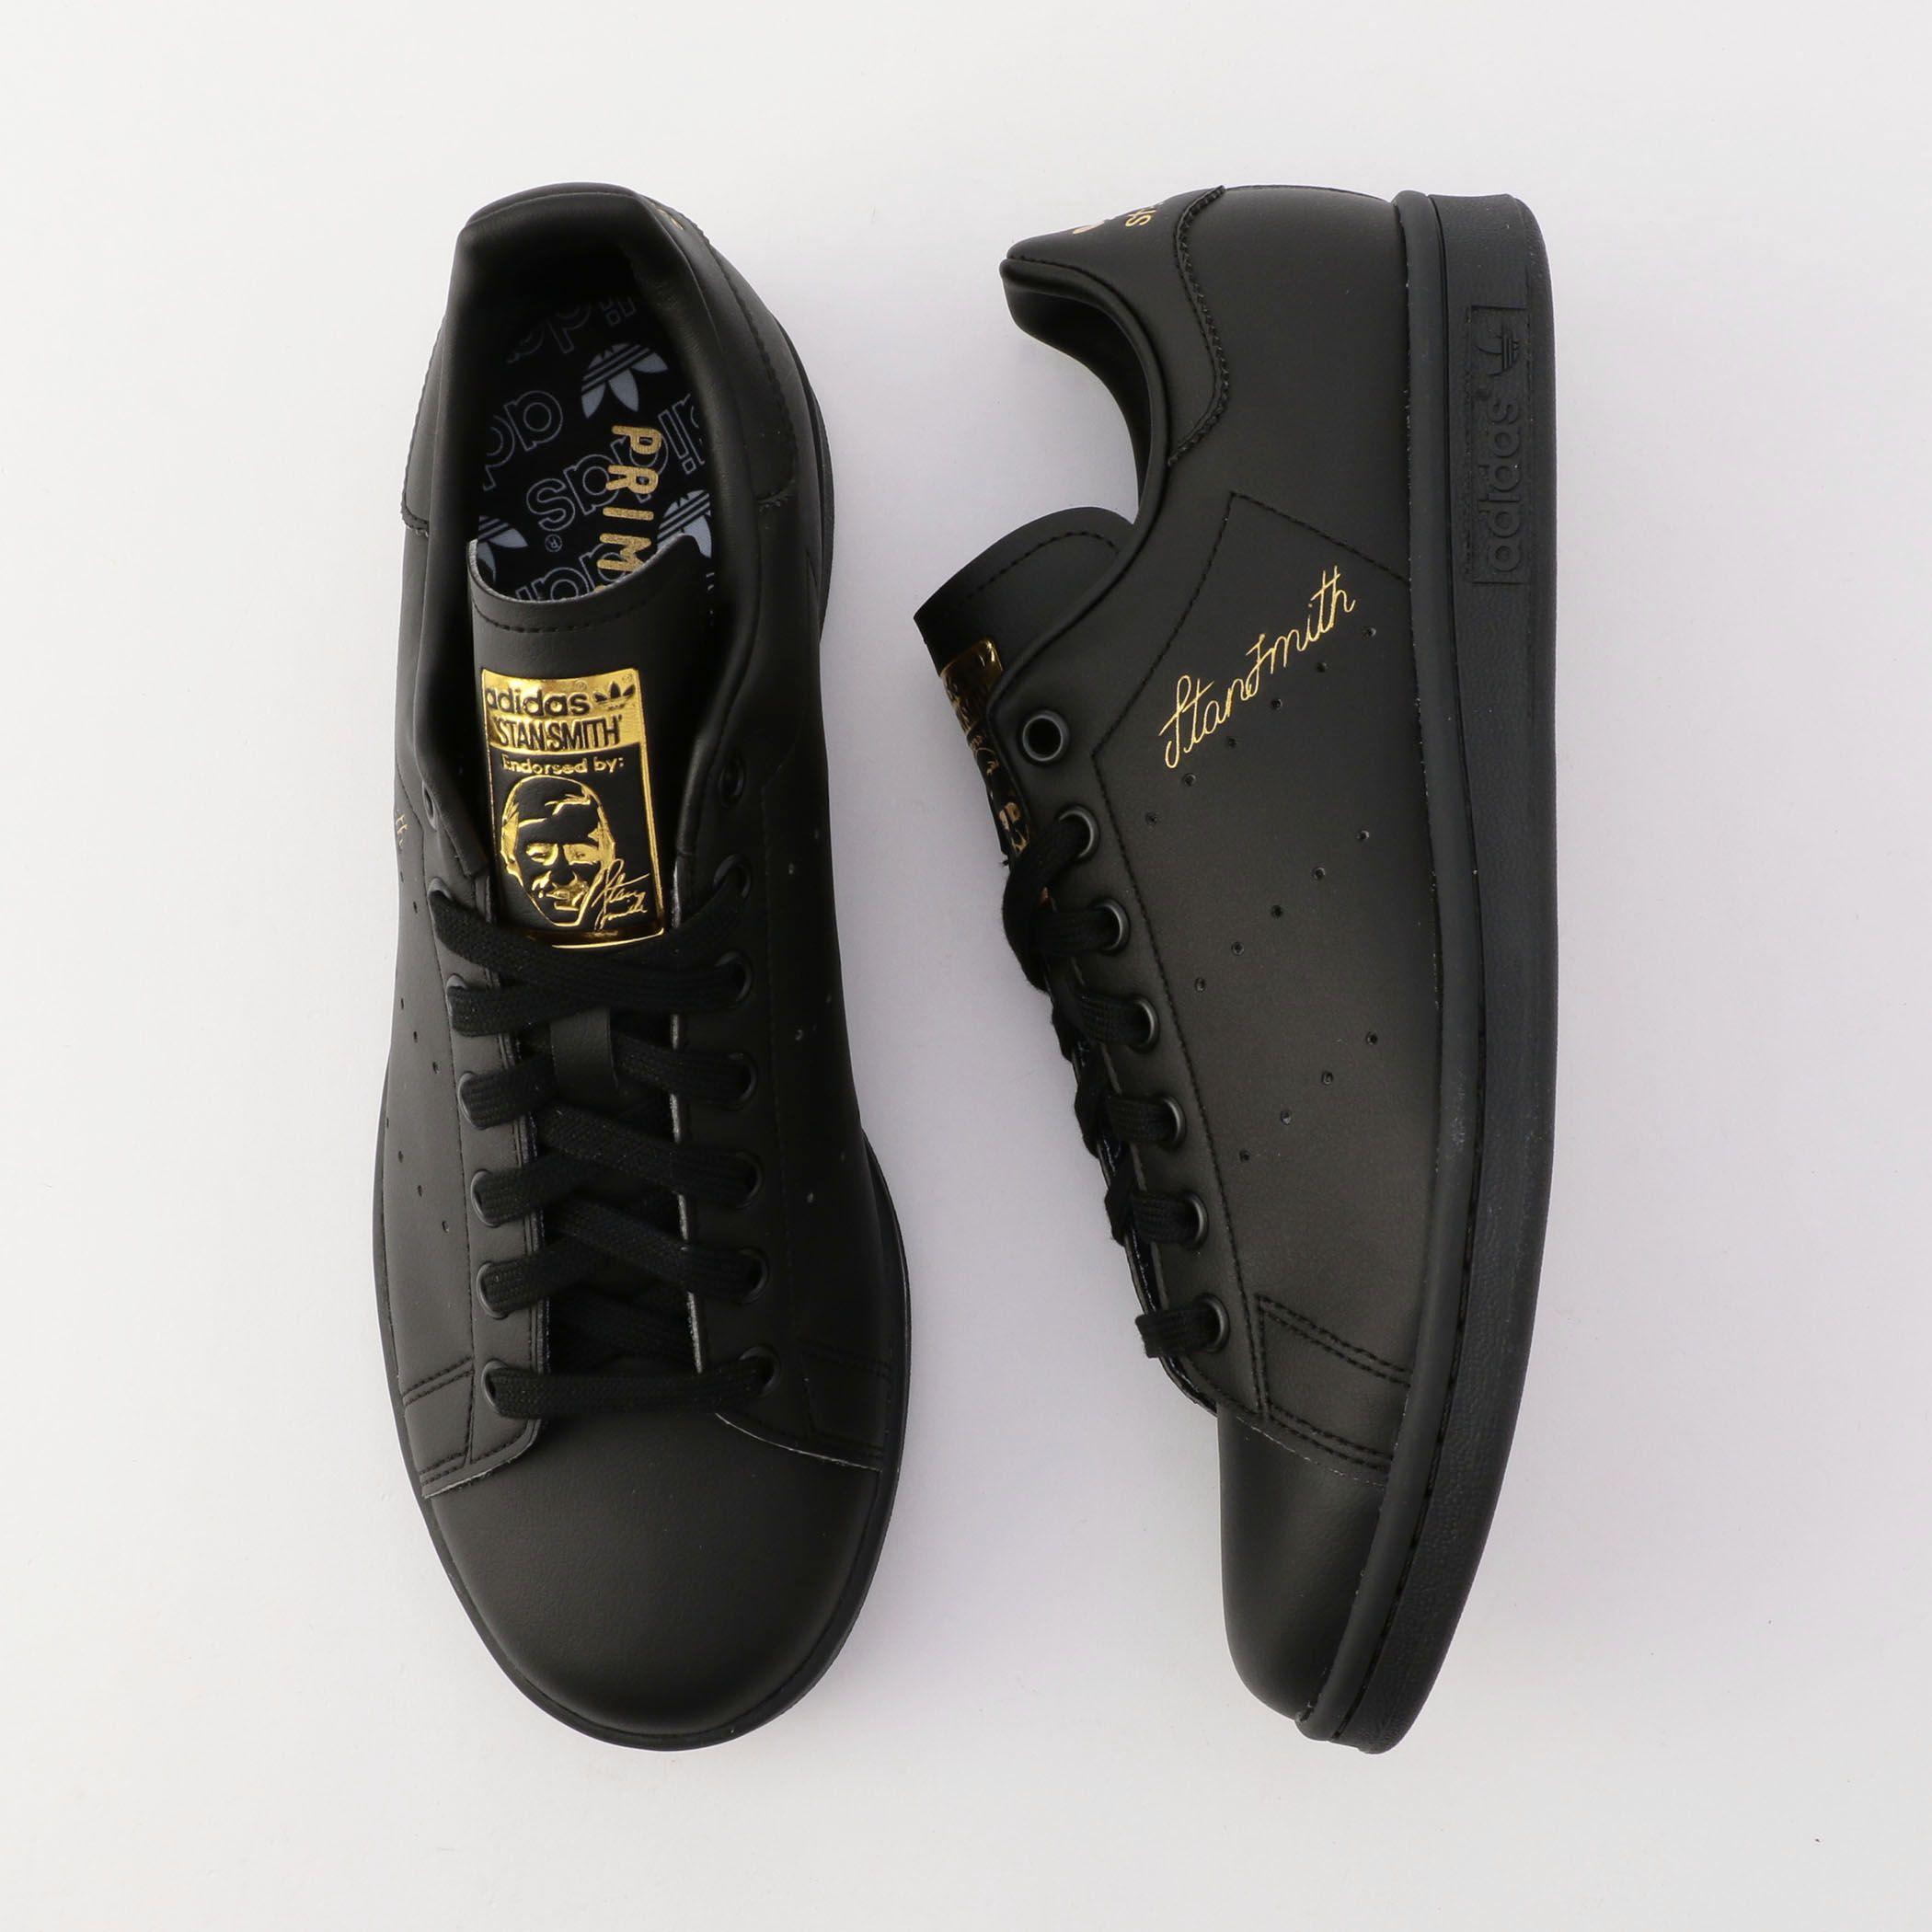 NOLLEY'S goodman(ノーリーズグッドマン)/【adidas/アディダス】STAN SMITH BLK スタンスミス PRIME GREEN #S75075